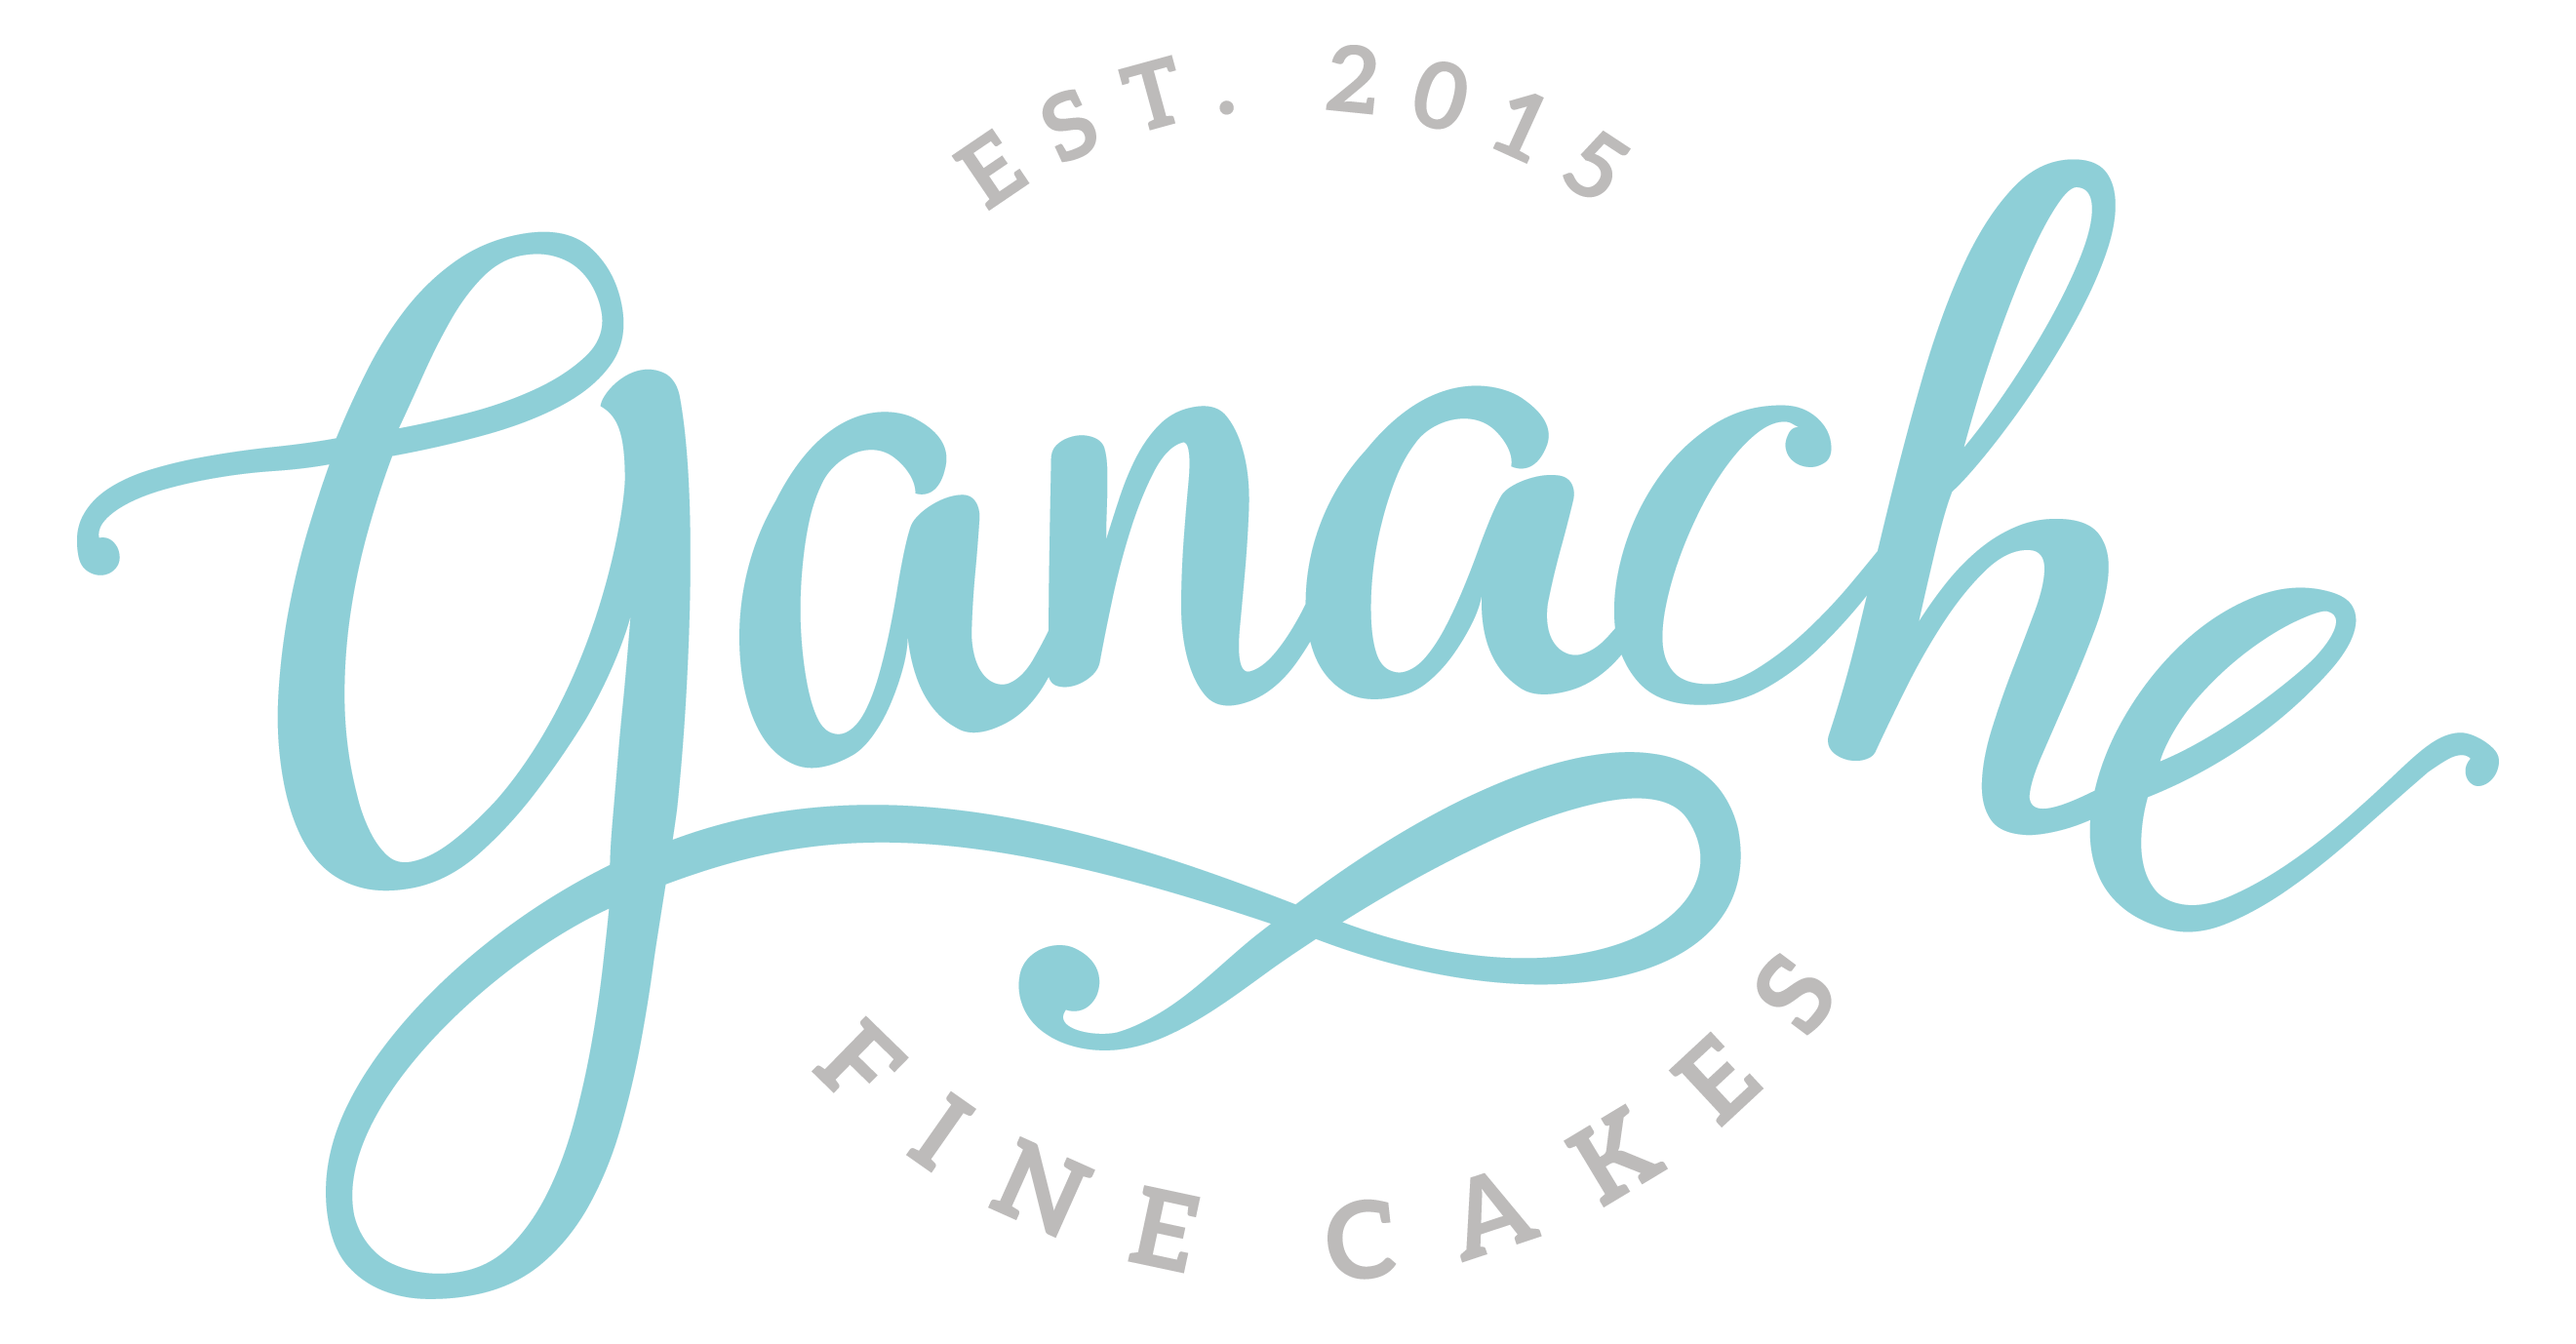 ganache fine cakes needs a fantastic new logo!